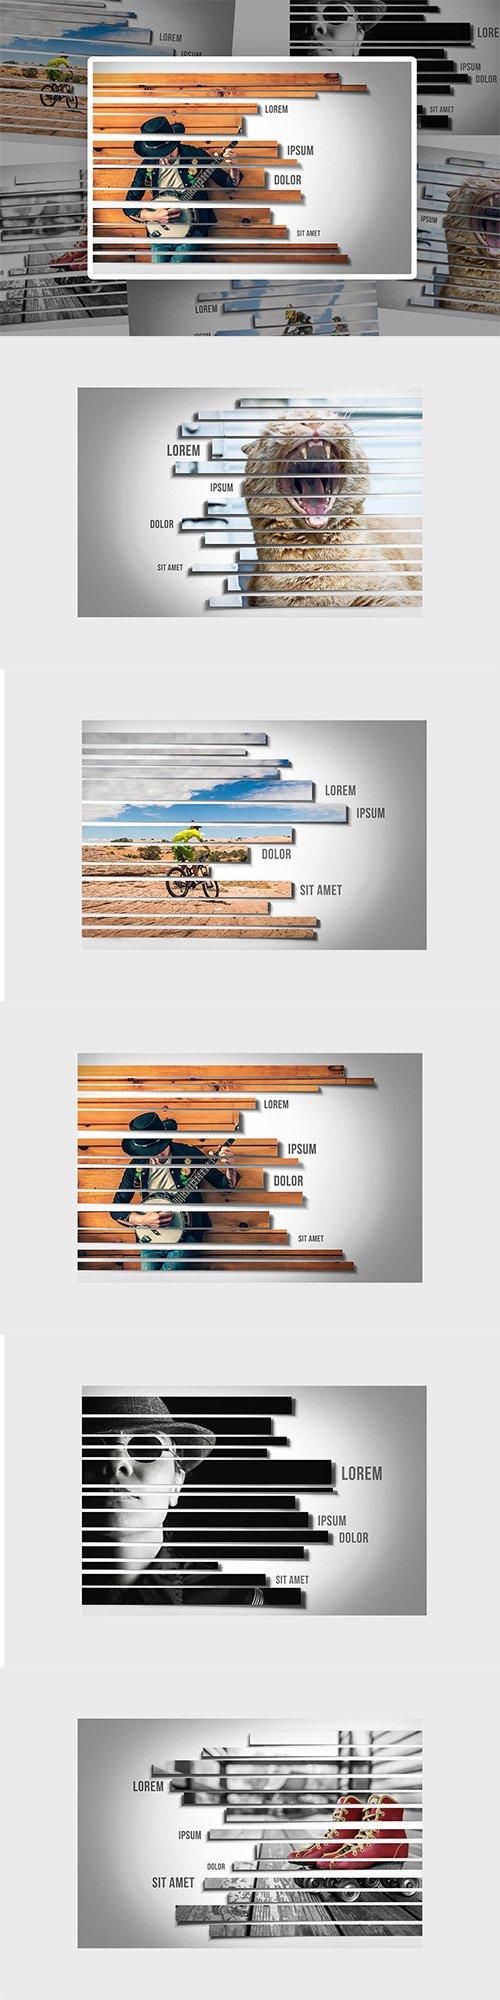 Stripes Photo Frame Template